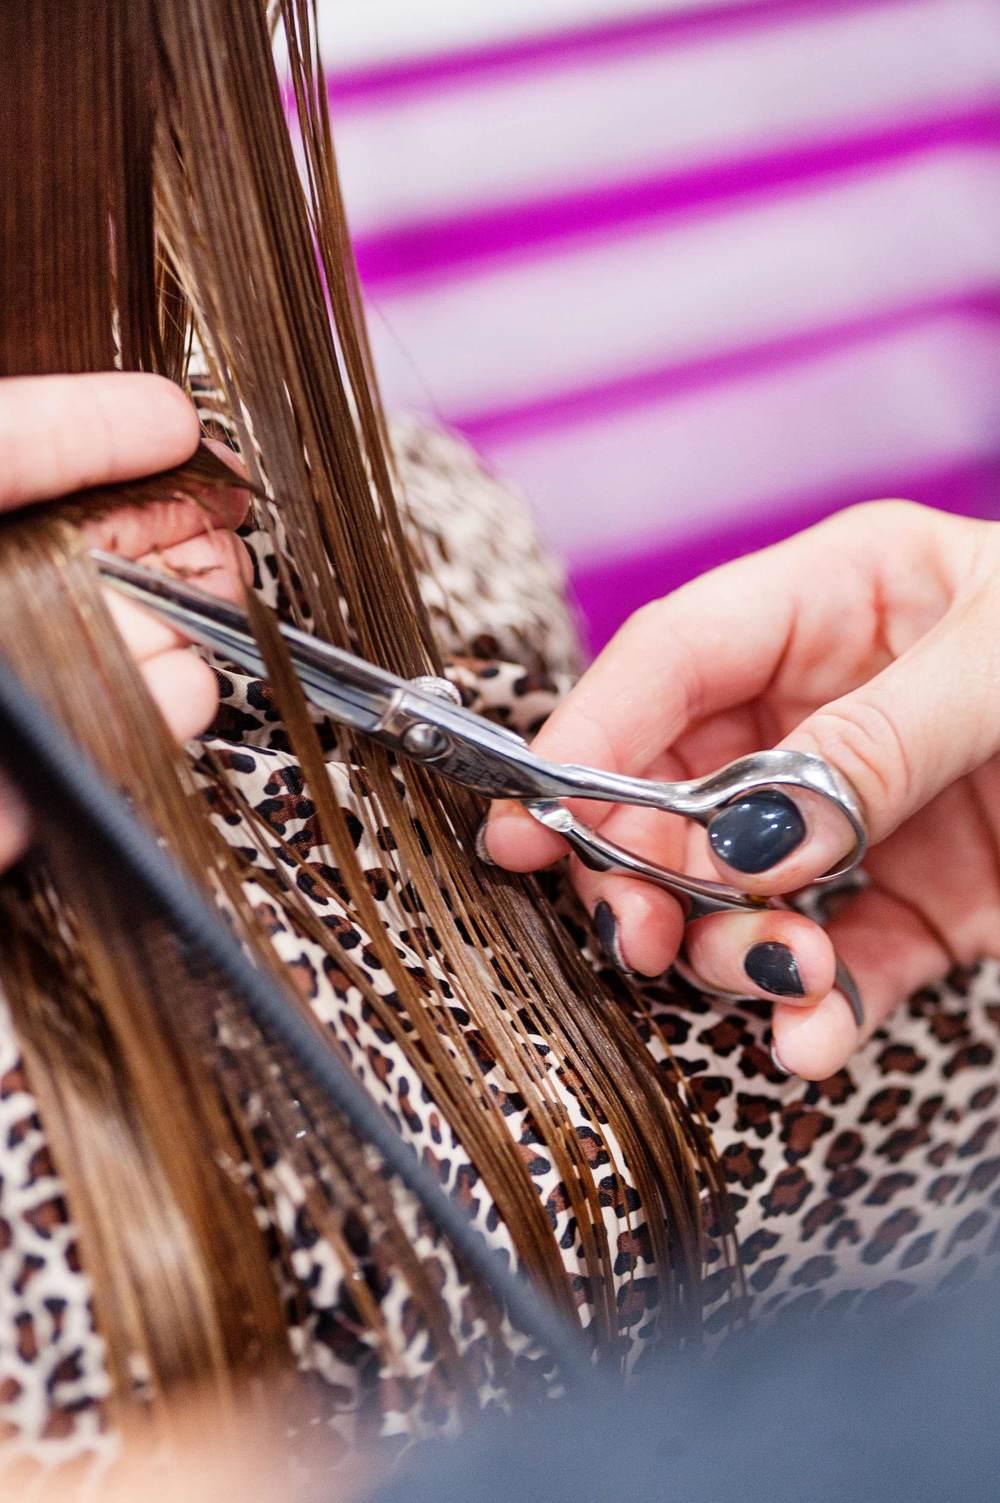 haircut-young-woman-invent-salon.jpg